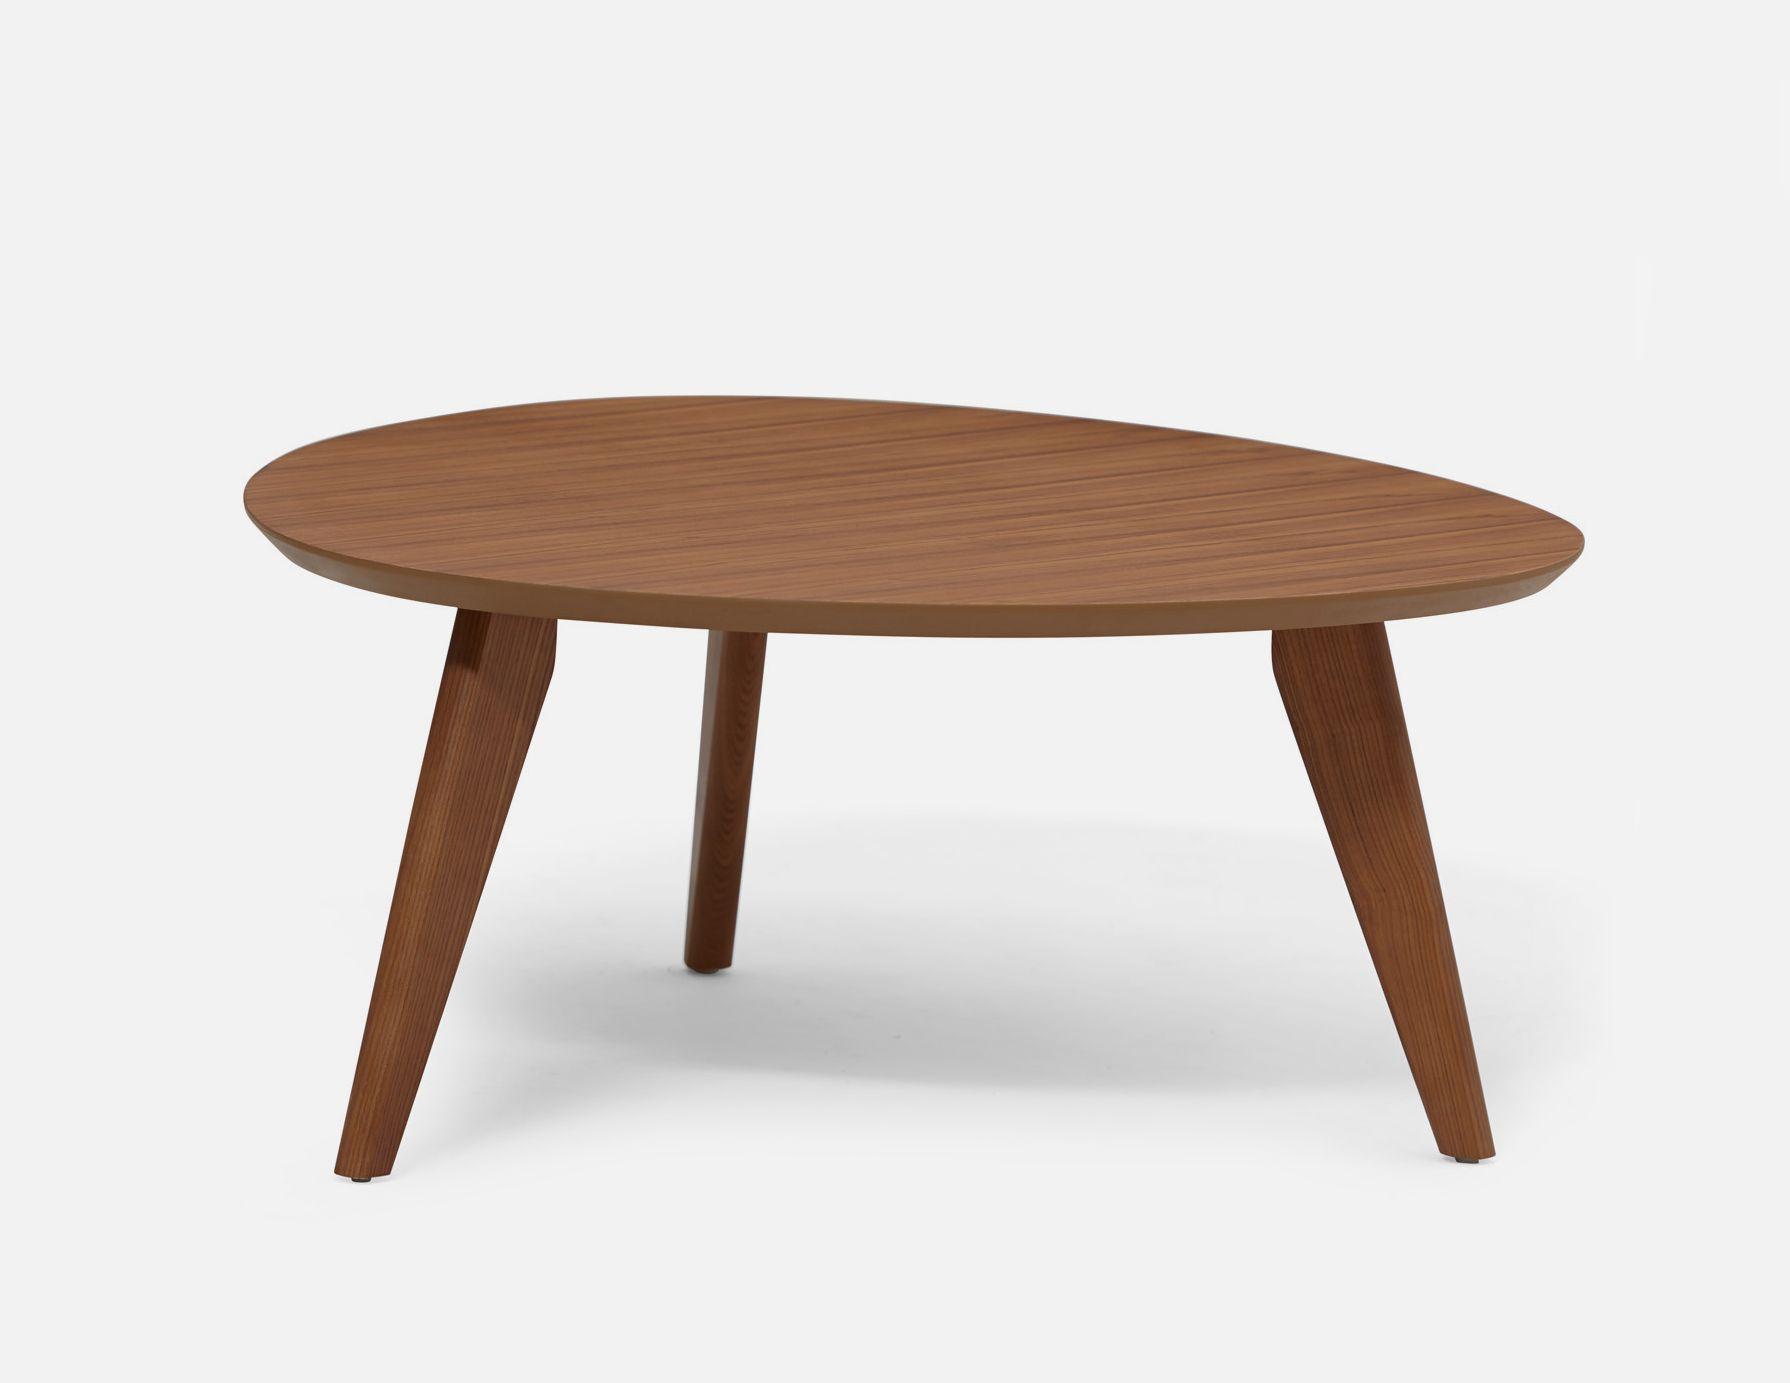 Structube Teak Coffee Table 90cm Osaka In 2020 Teak Coffee Table Coffee Table Structube Coffee Table [ 1383 x 1790 Pixel ]